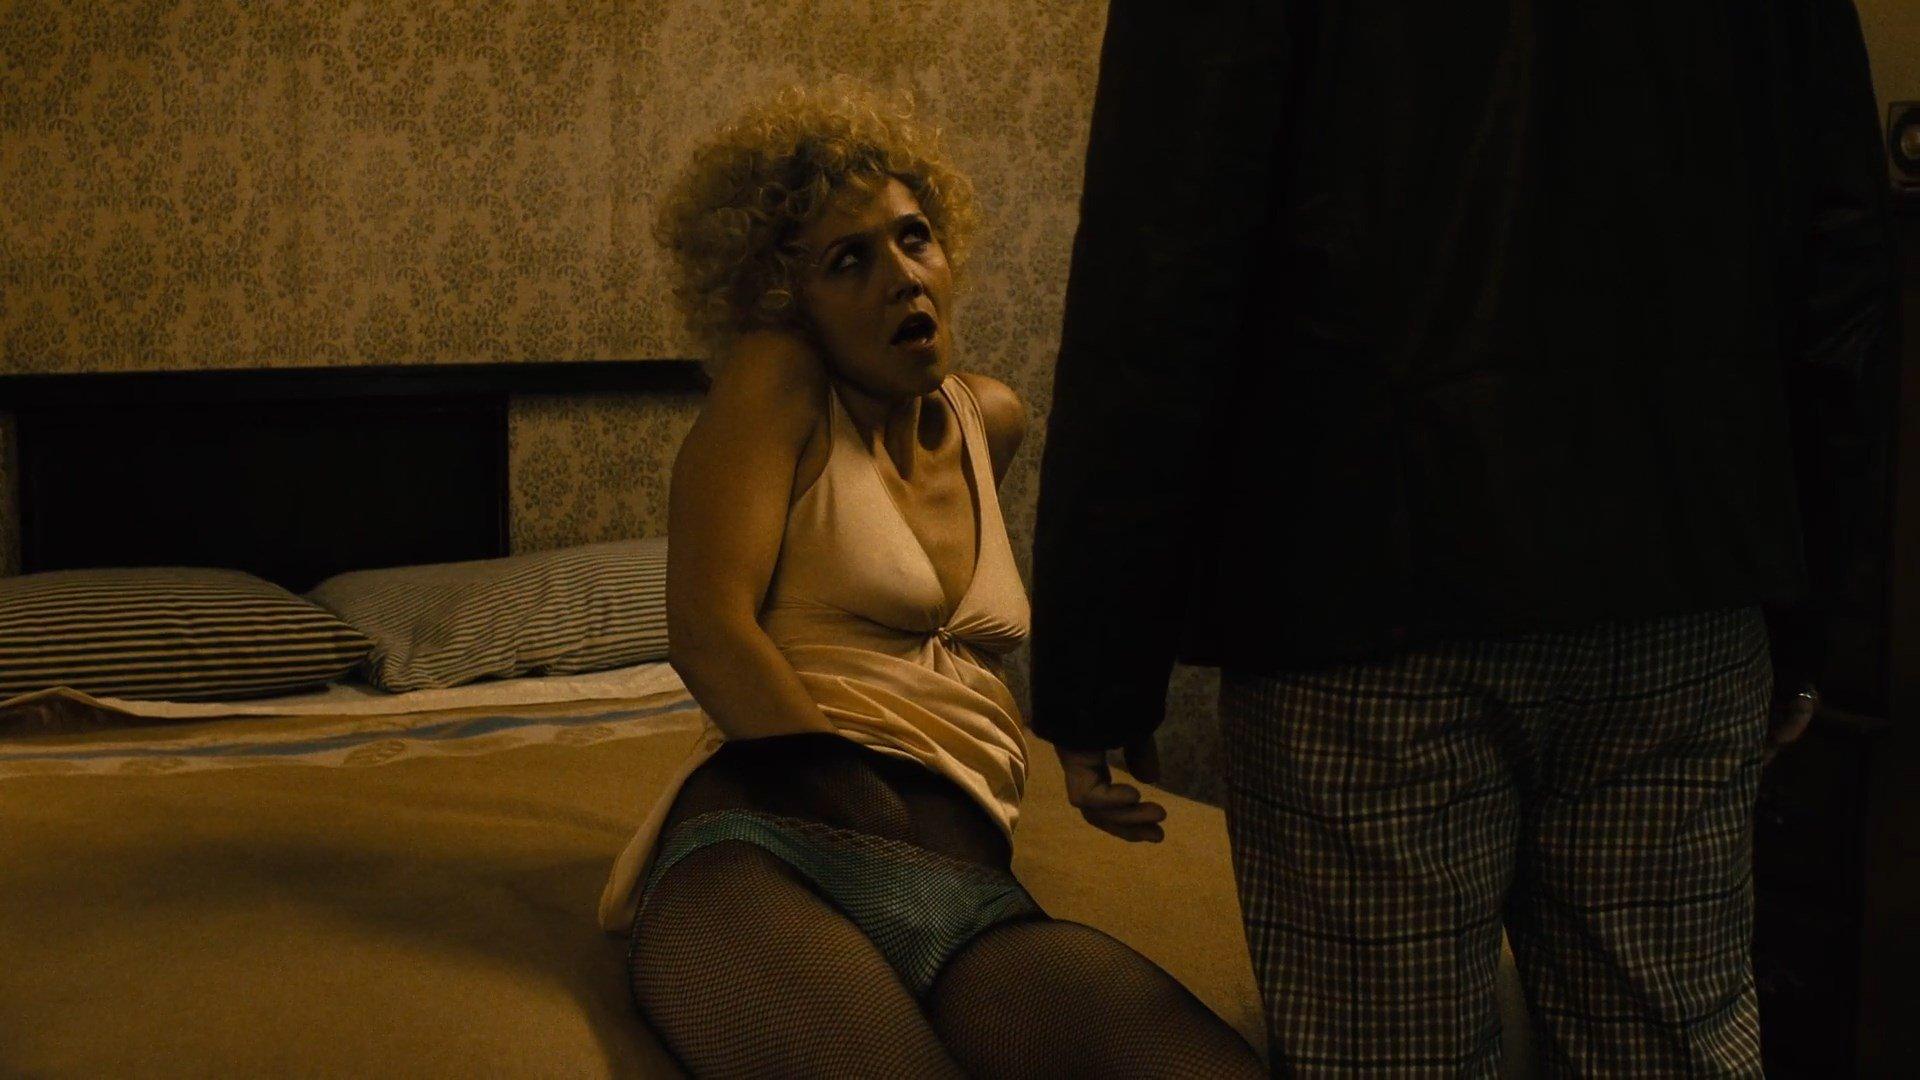 Maggie gyllenhaal naked full frontal hd 10